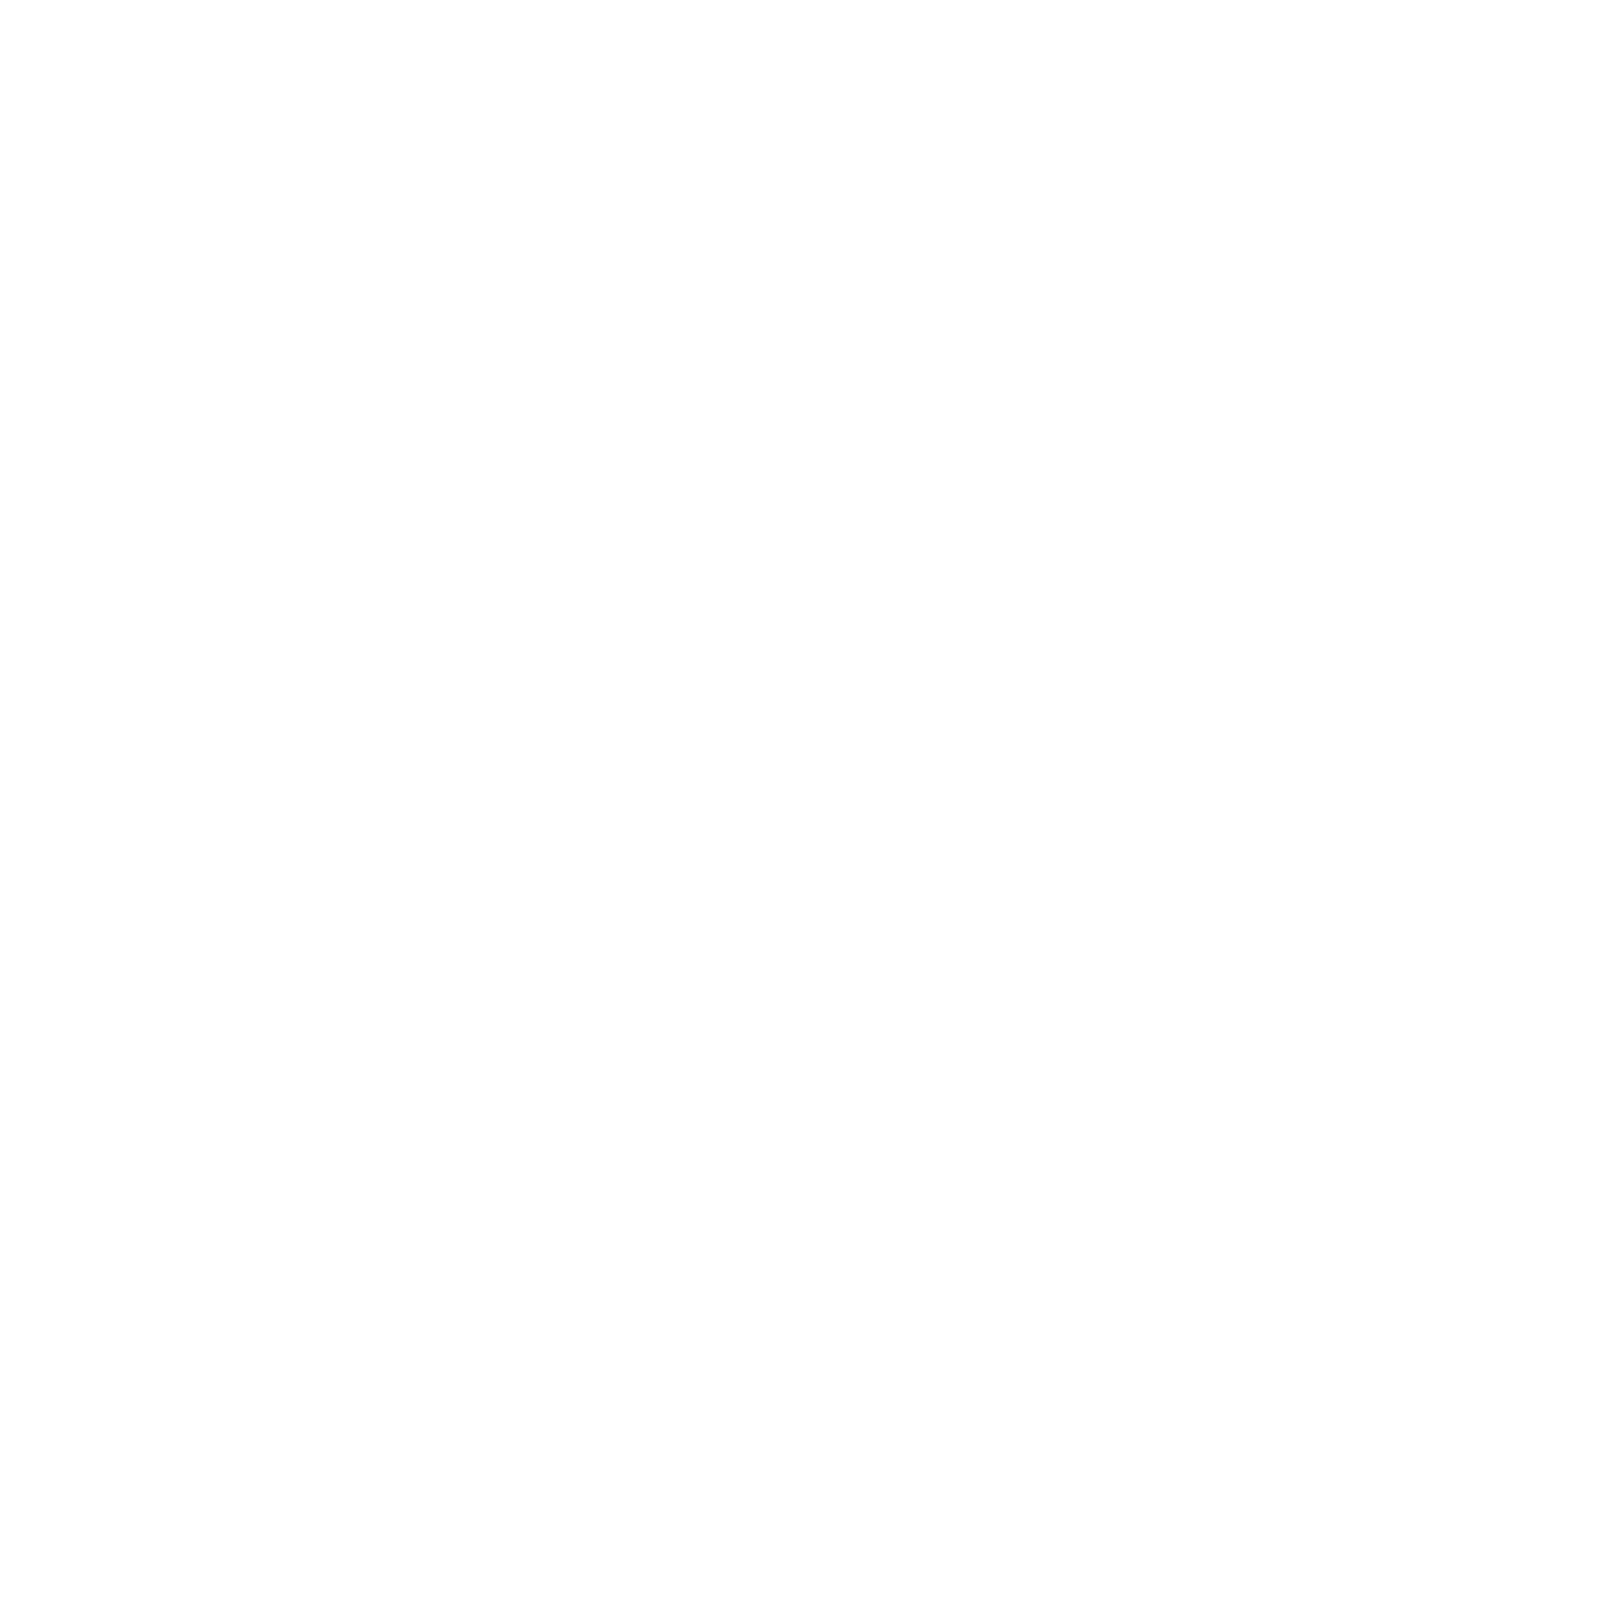 WLG-project-logo